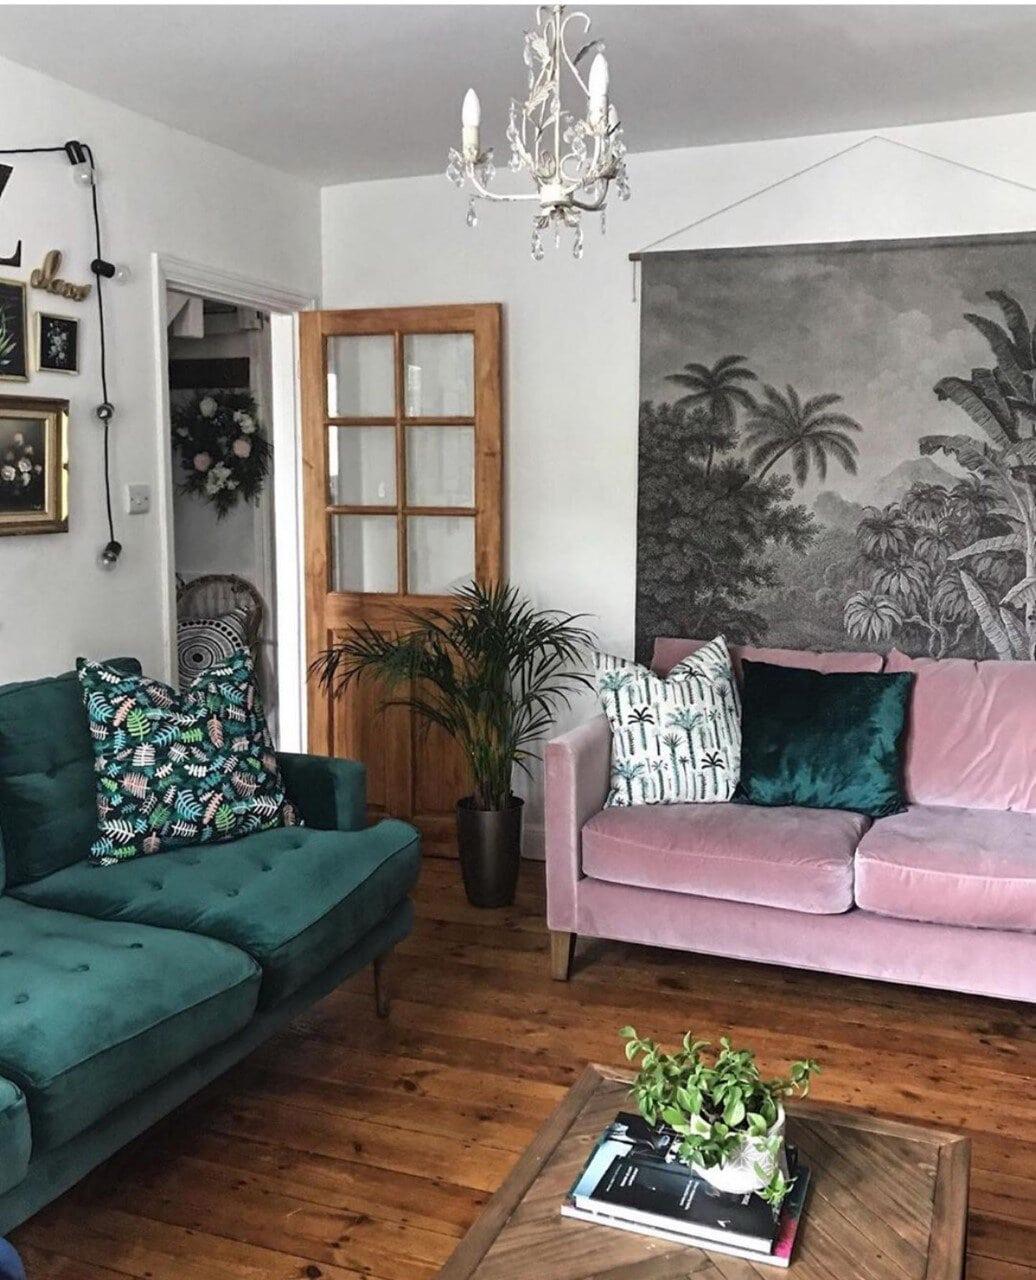 interior design, instagram, instagram trends, home decor, social media, blogging, instagram advice, blogging advice, pinterest, living room, pink sofa, green sofa